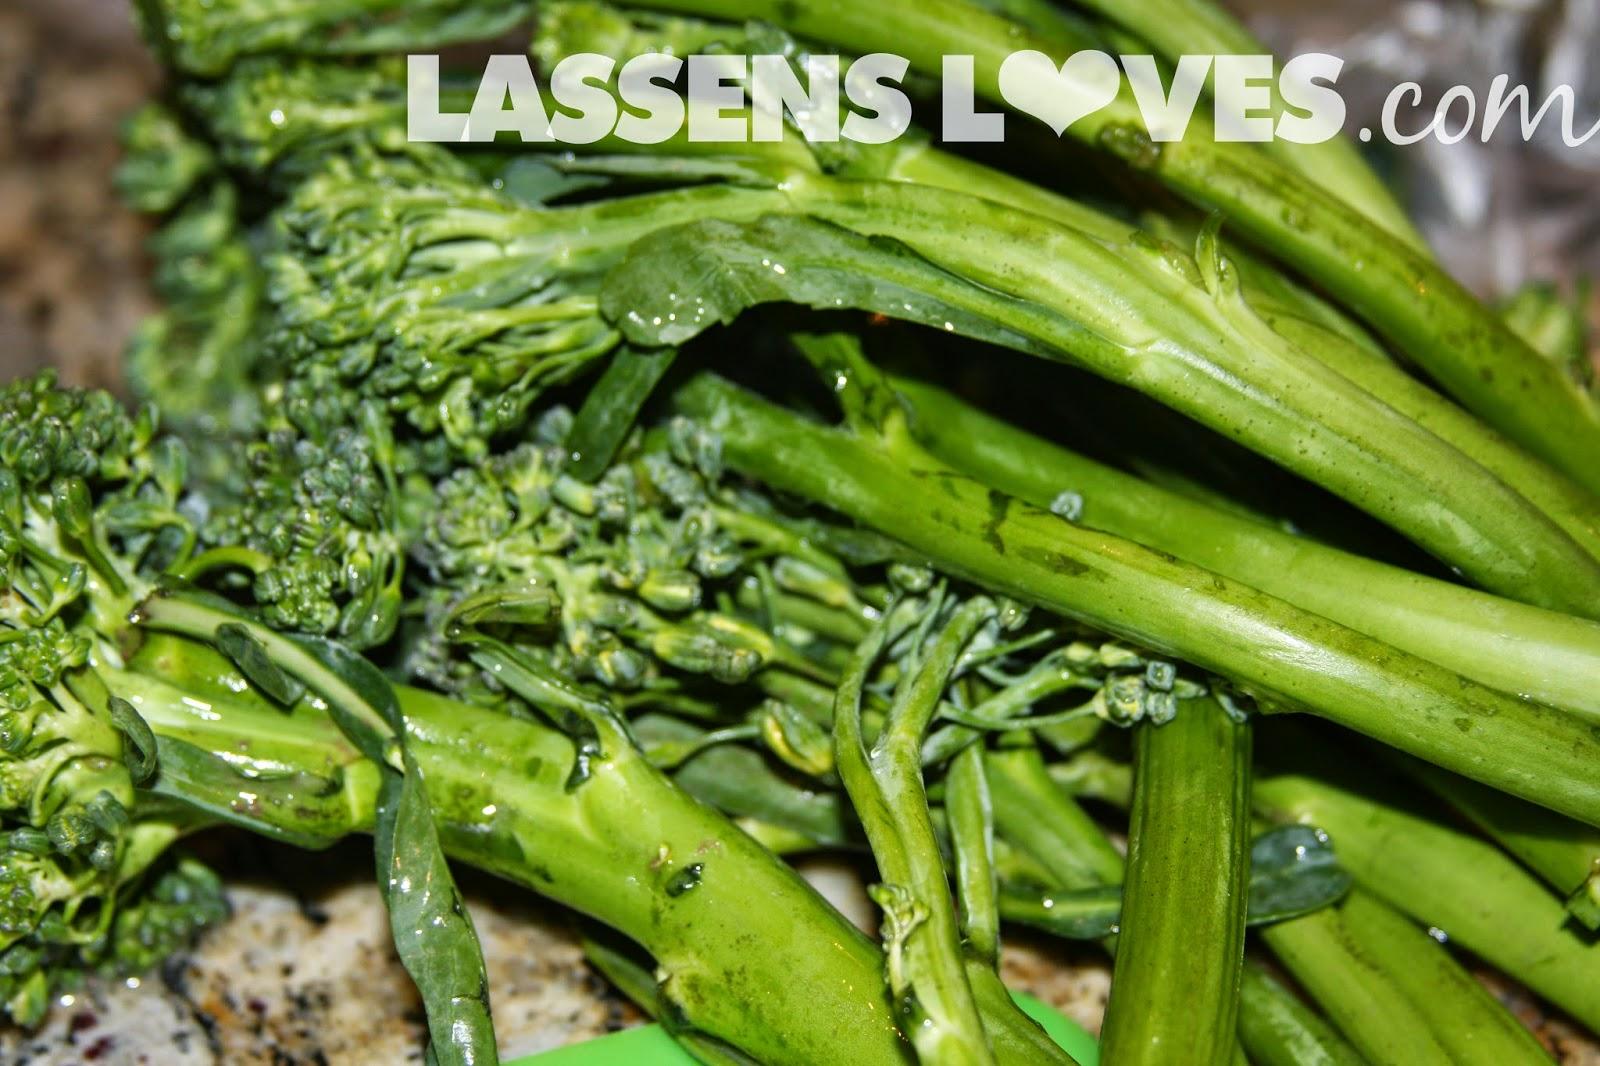 broccoli+rabe, broccoli+rapini, rarini+recipes, noodle+bowl+recipes, rabe+recipes, raab+recipes